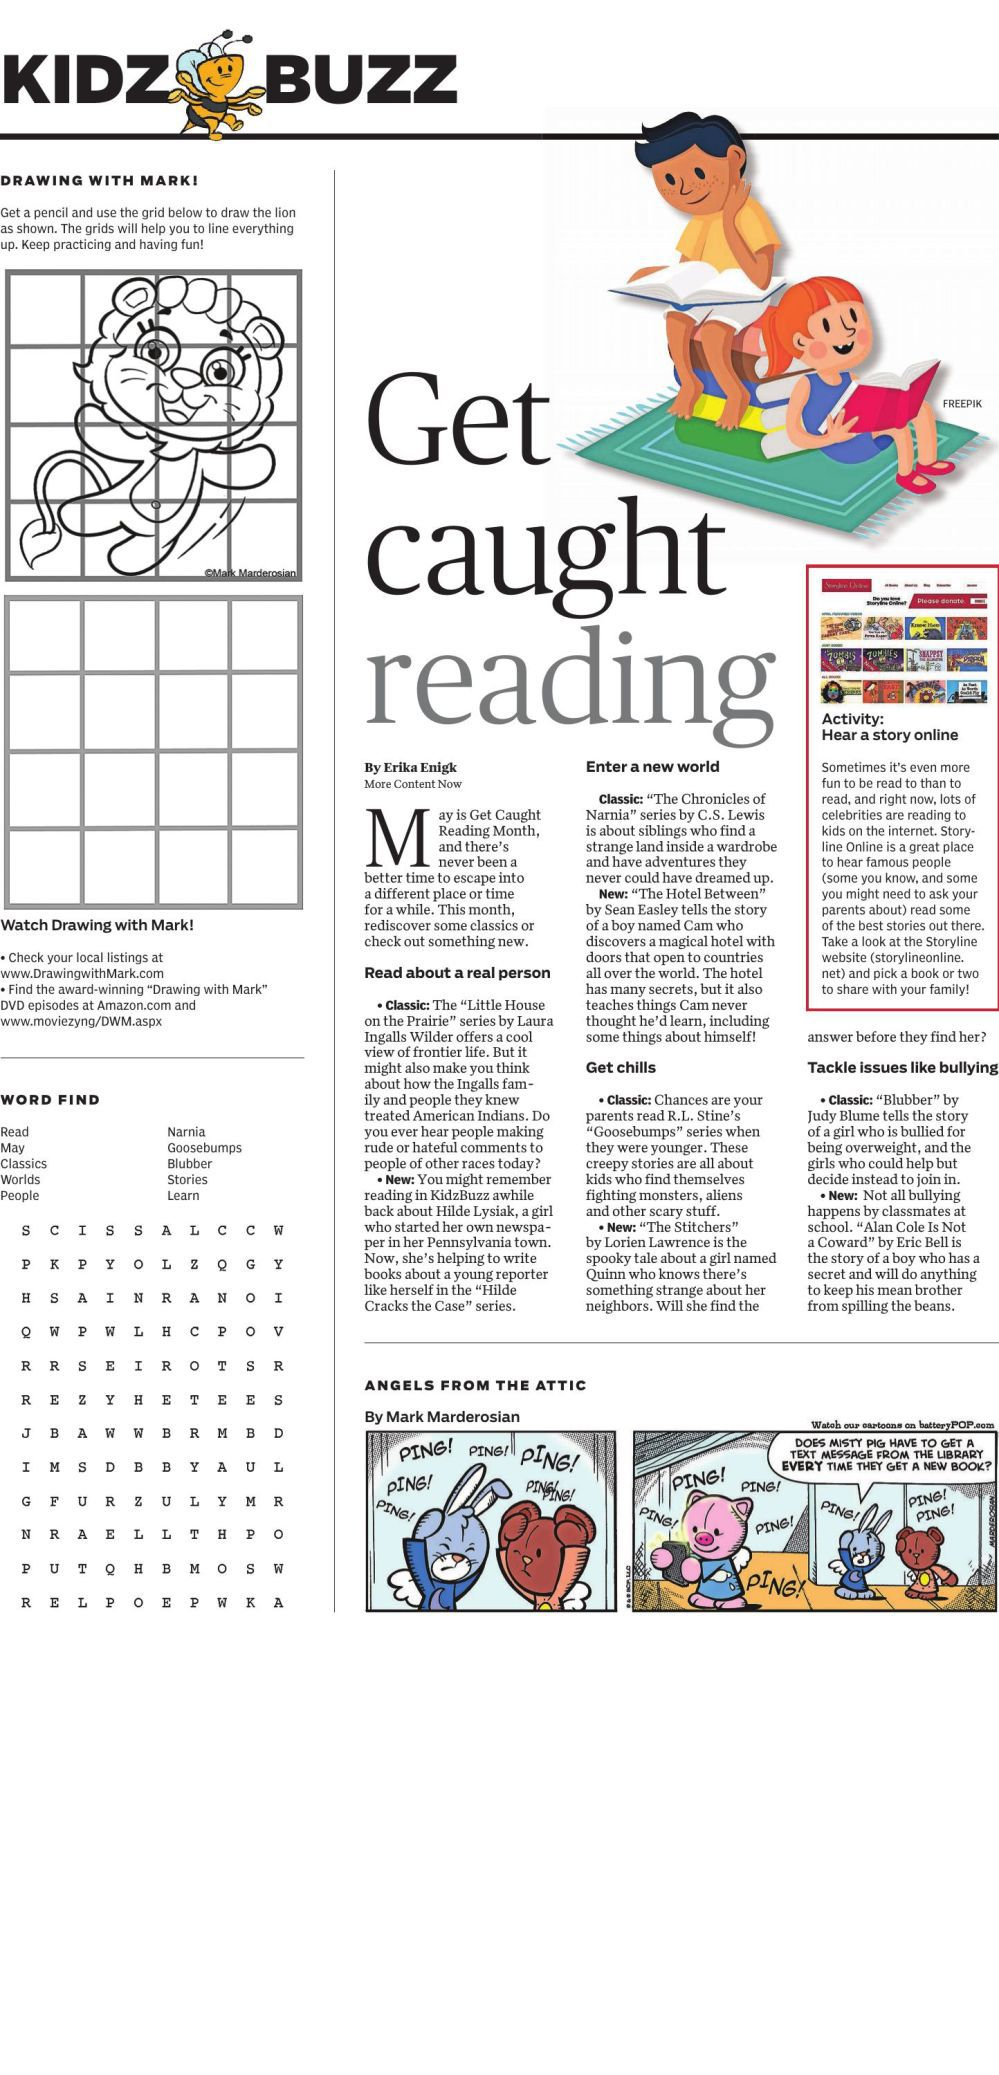 Kids Buzz: Get Caught Reading